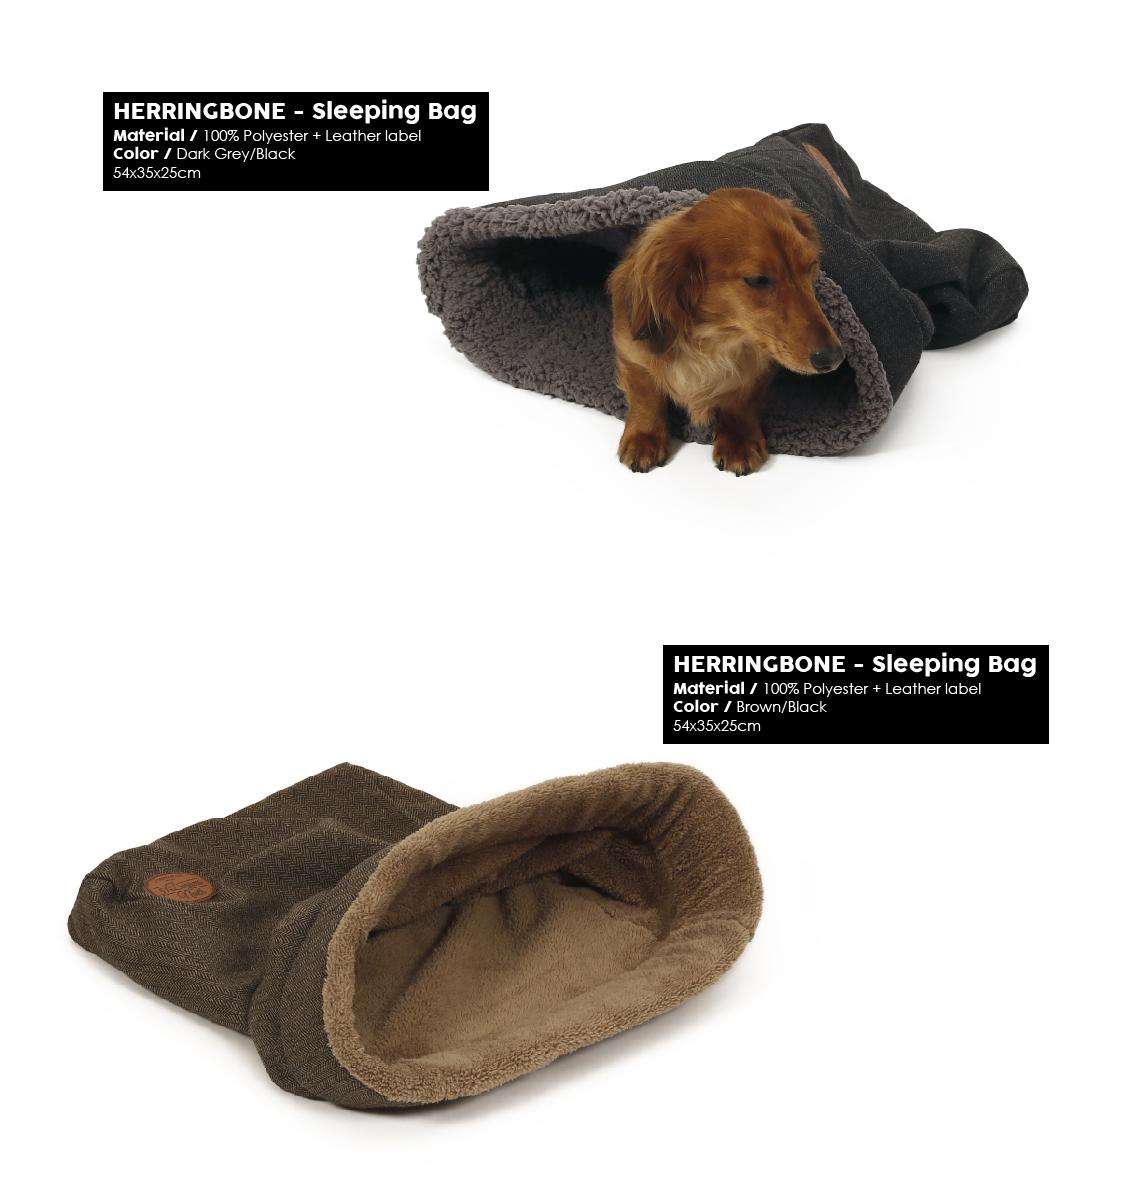 Herringbone (AY) - Sleepingbag